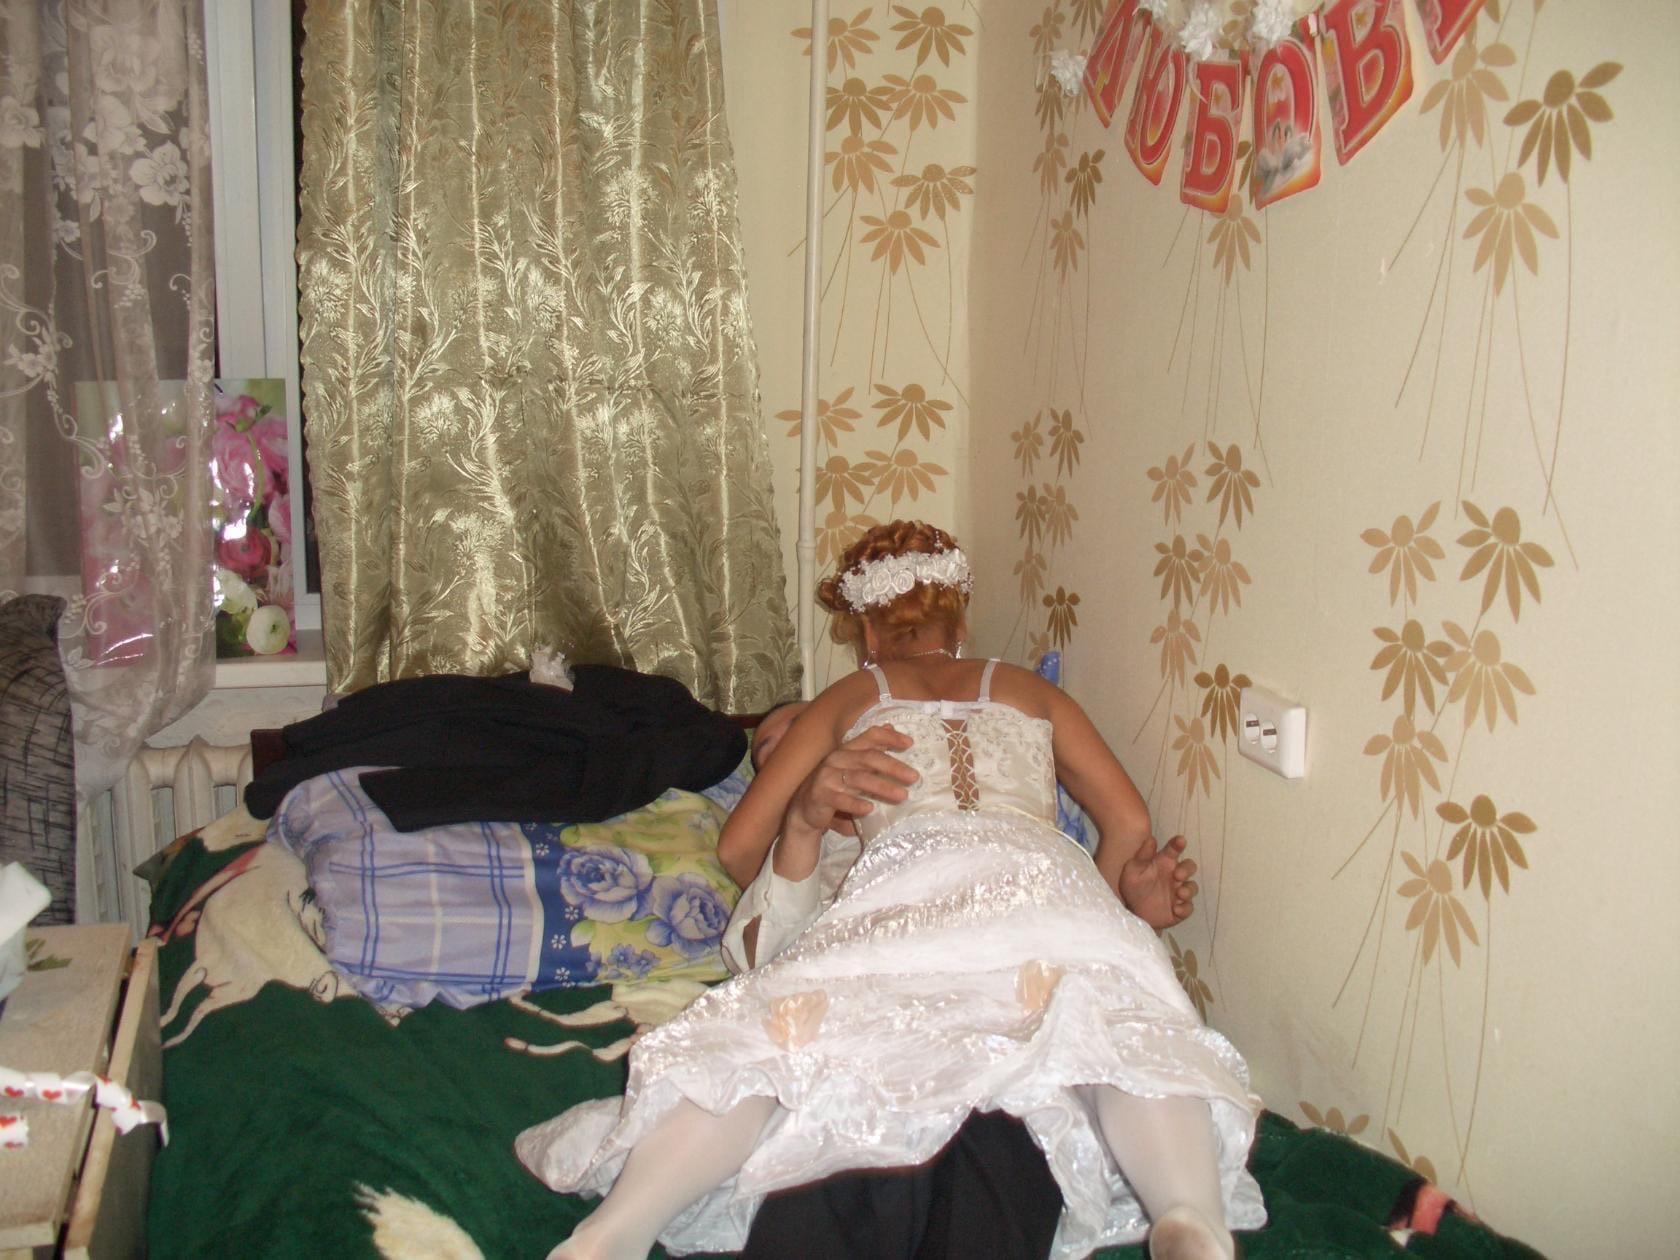 Russian Weddings: Merciless, Funny, Crazy